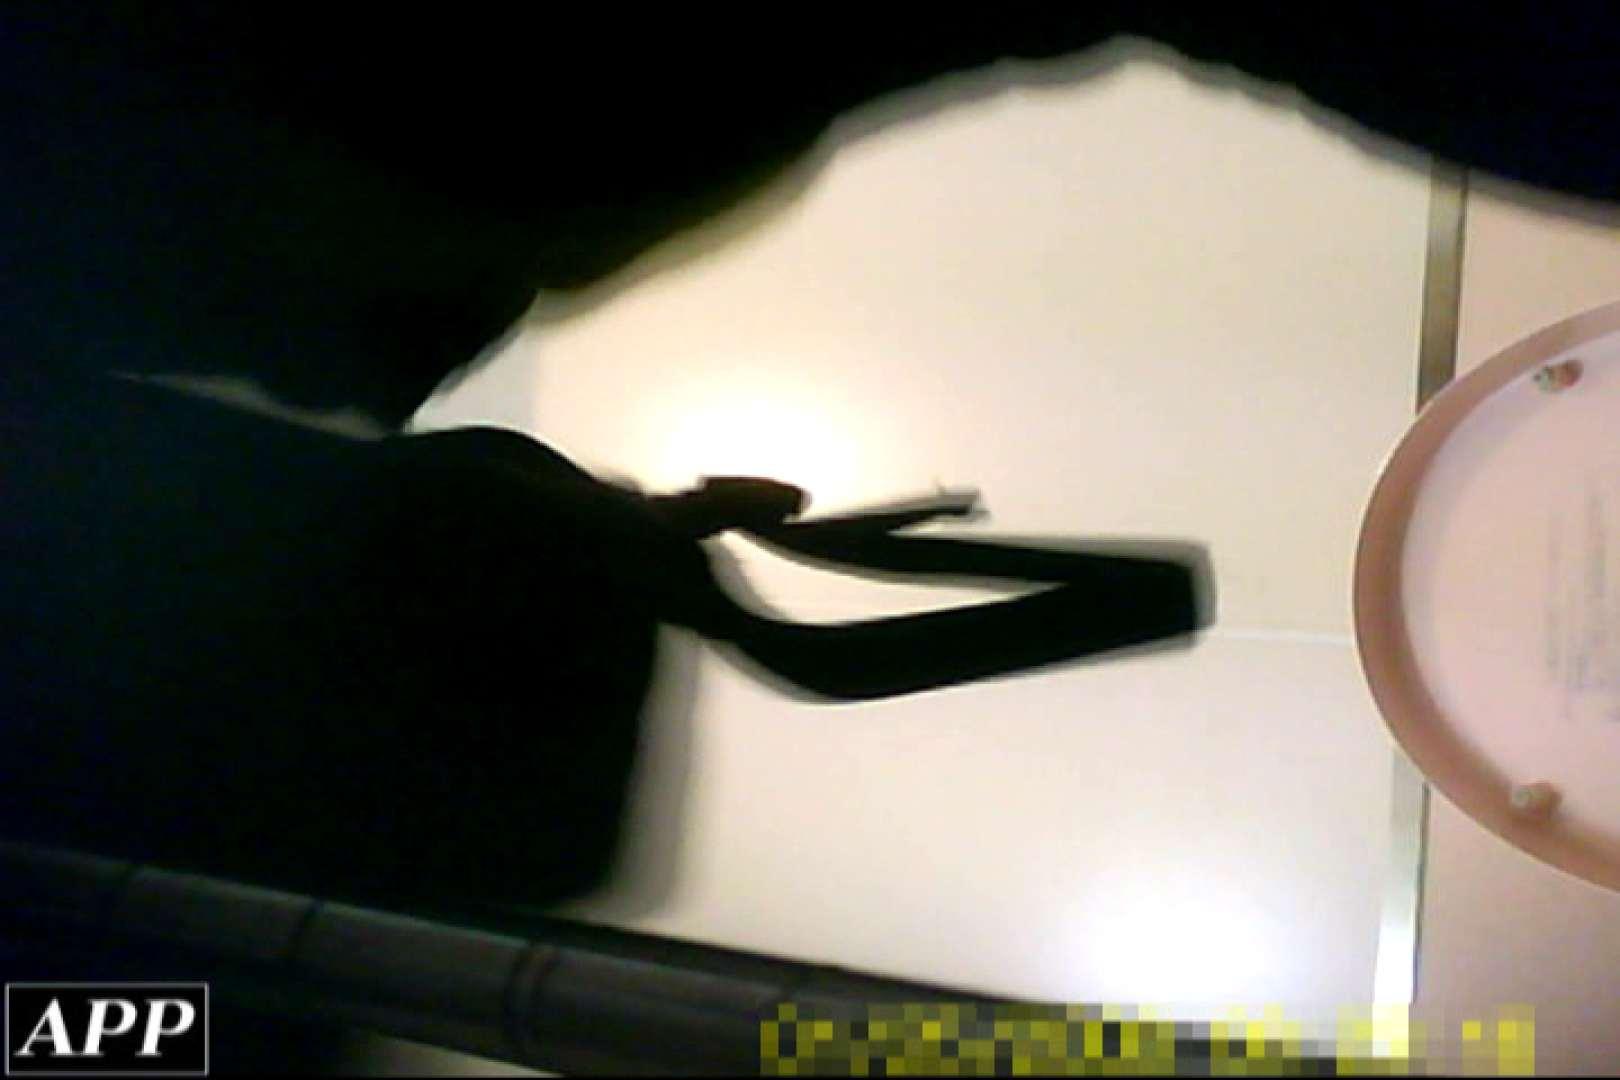 3視点洗面所 vol.57 OLハメ撮り  76Pix 42